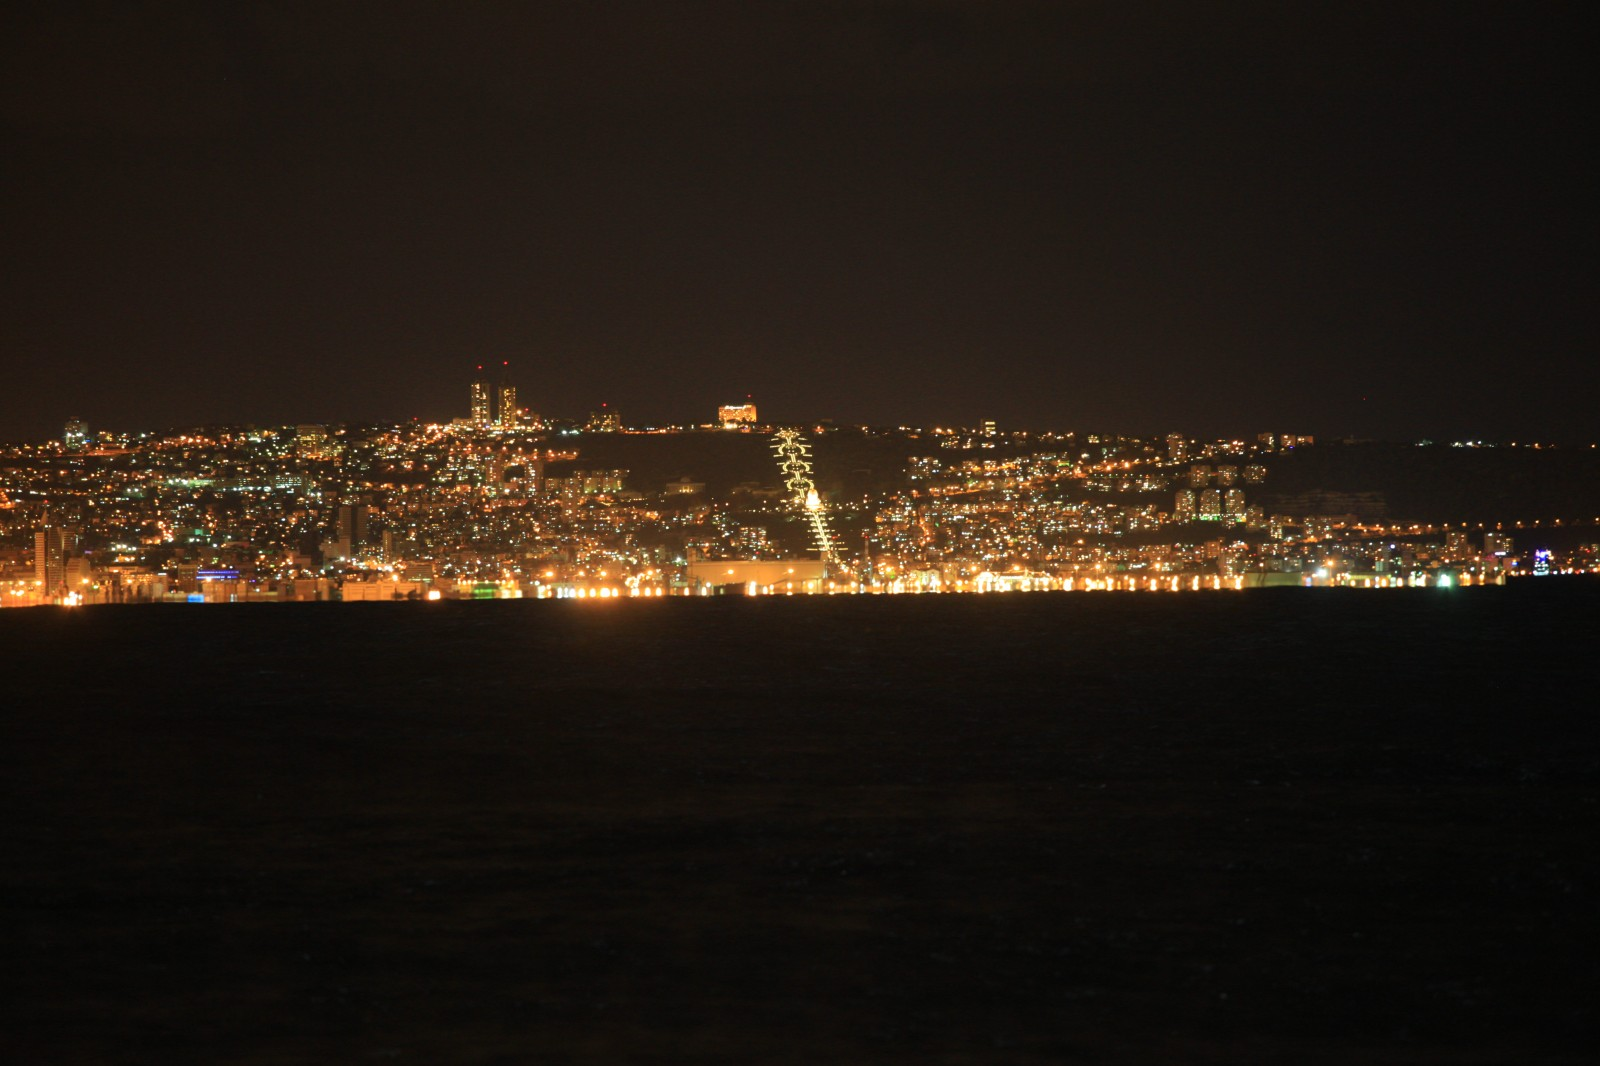 Haifa from across the bay, Bahai gardens in the center